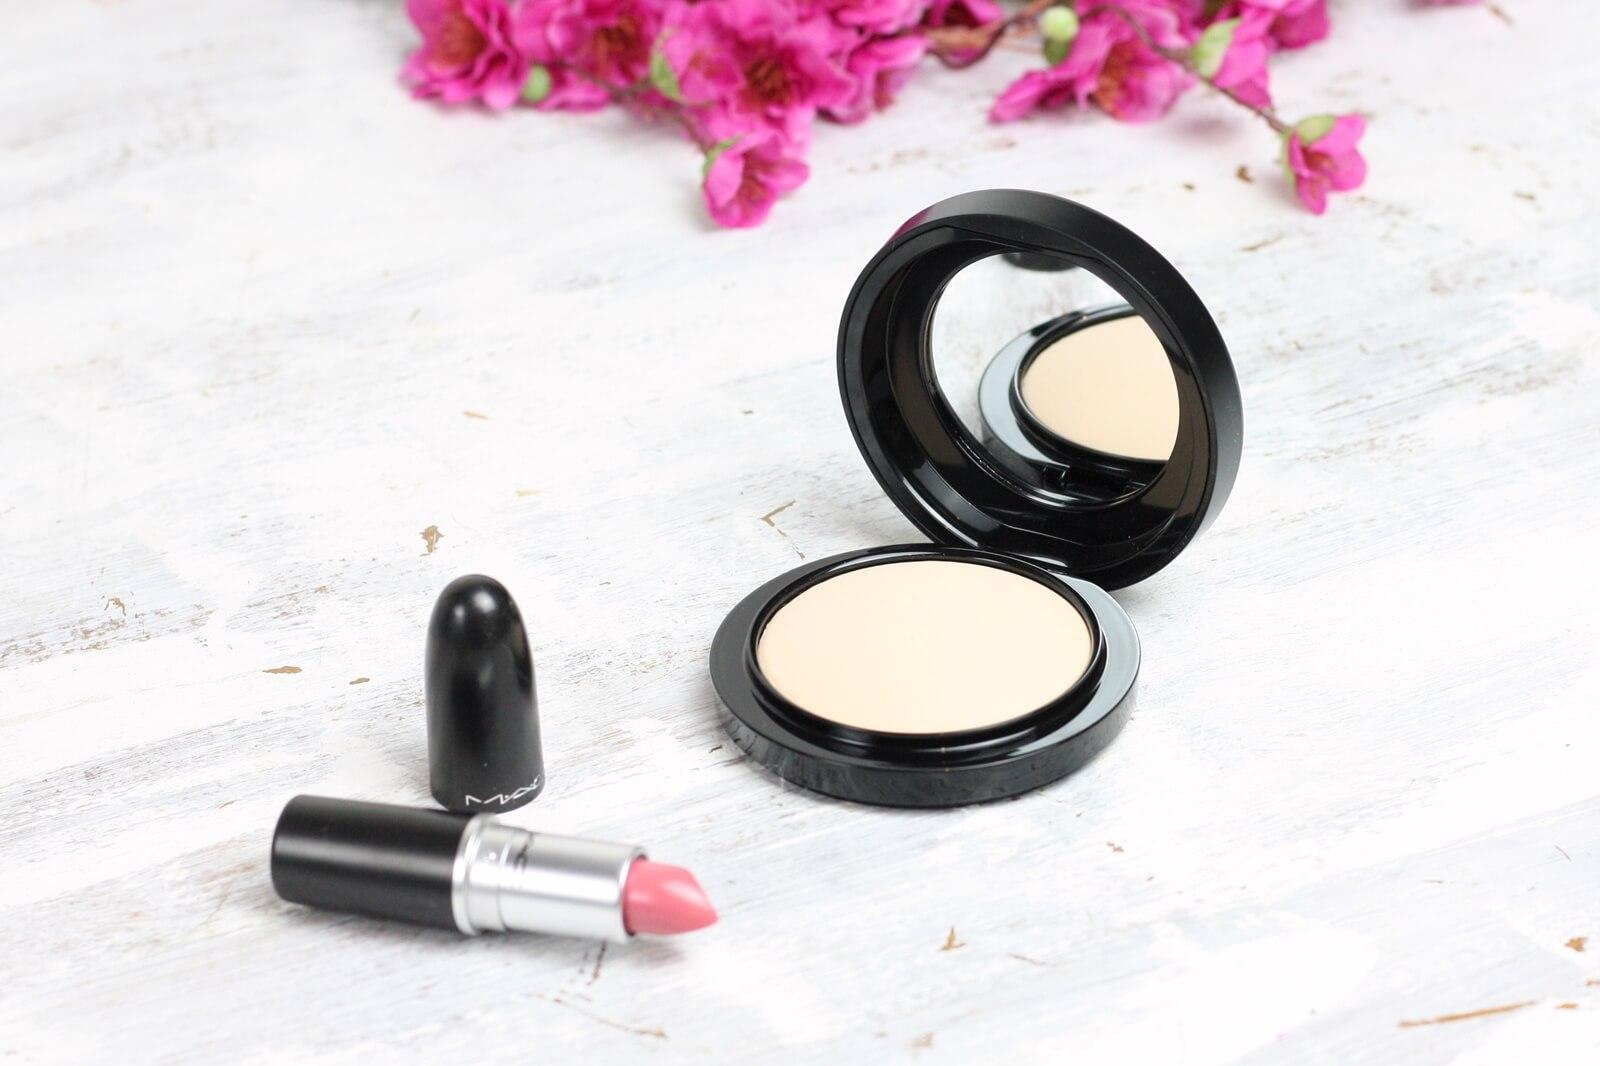 MAC Mineralize Skinfinish Natural - Light Plus